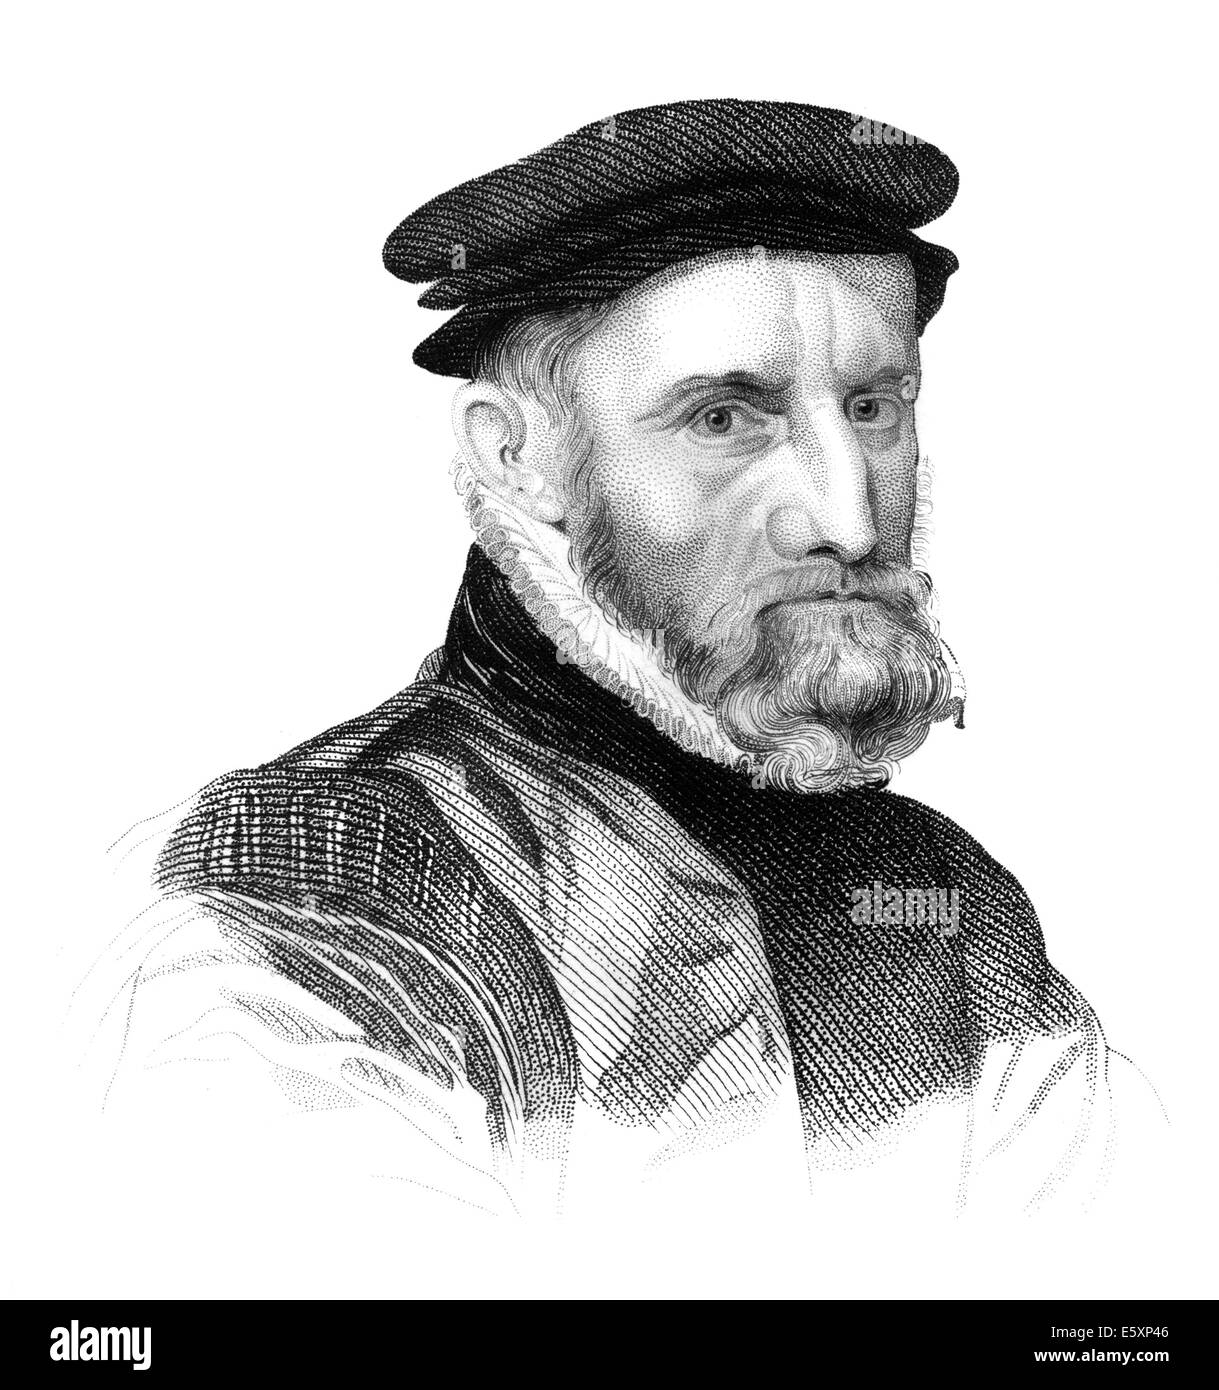 Sir Thomas Gresham the Elder, 1519-1579, an English merchant and financier, - Stock Image